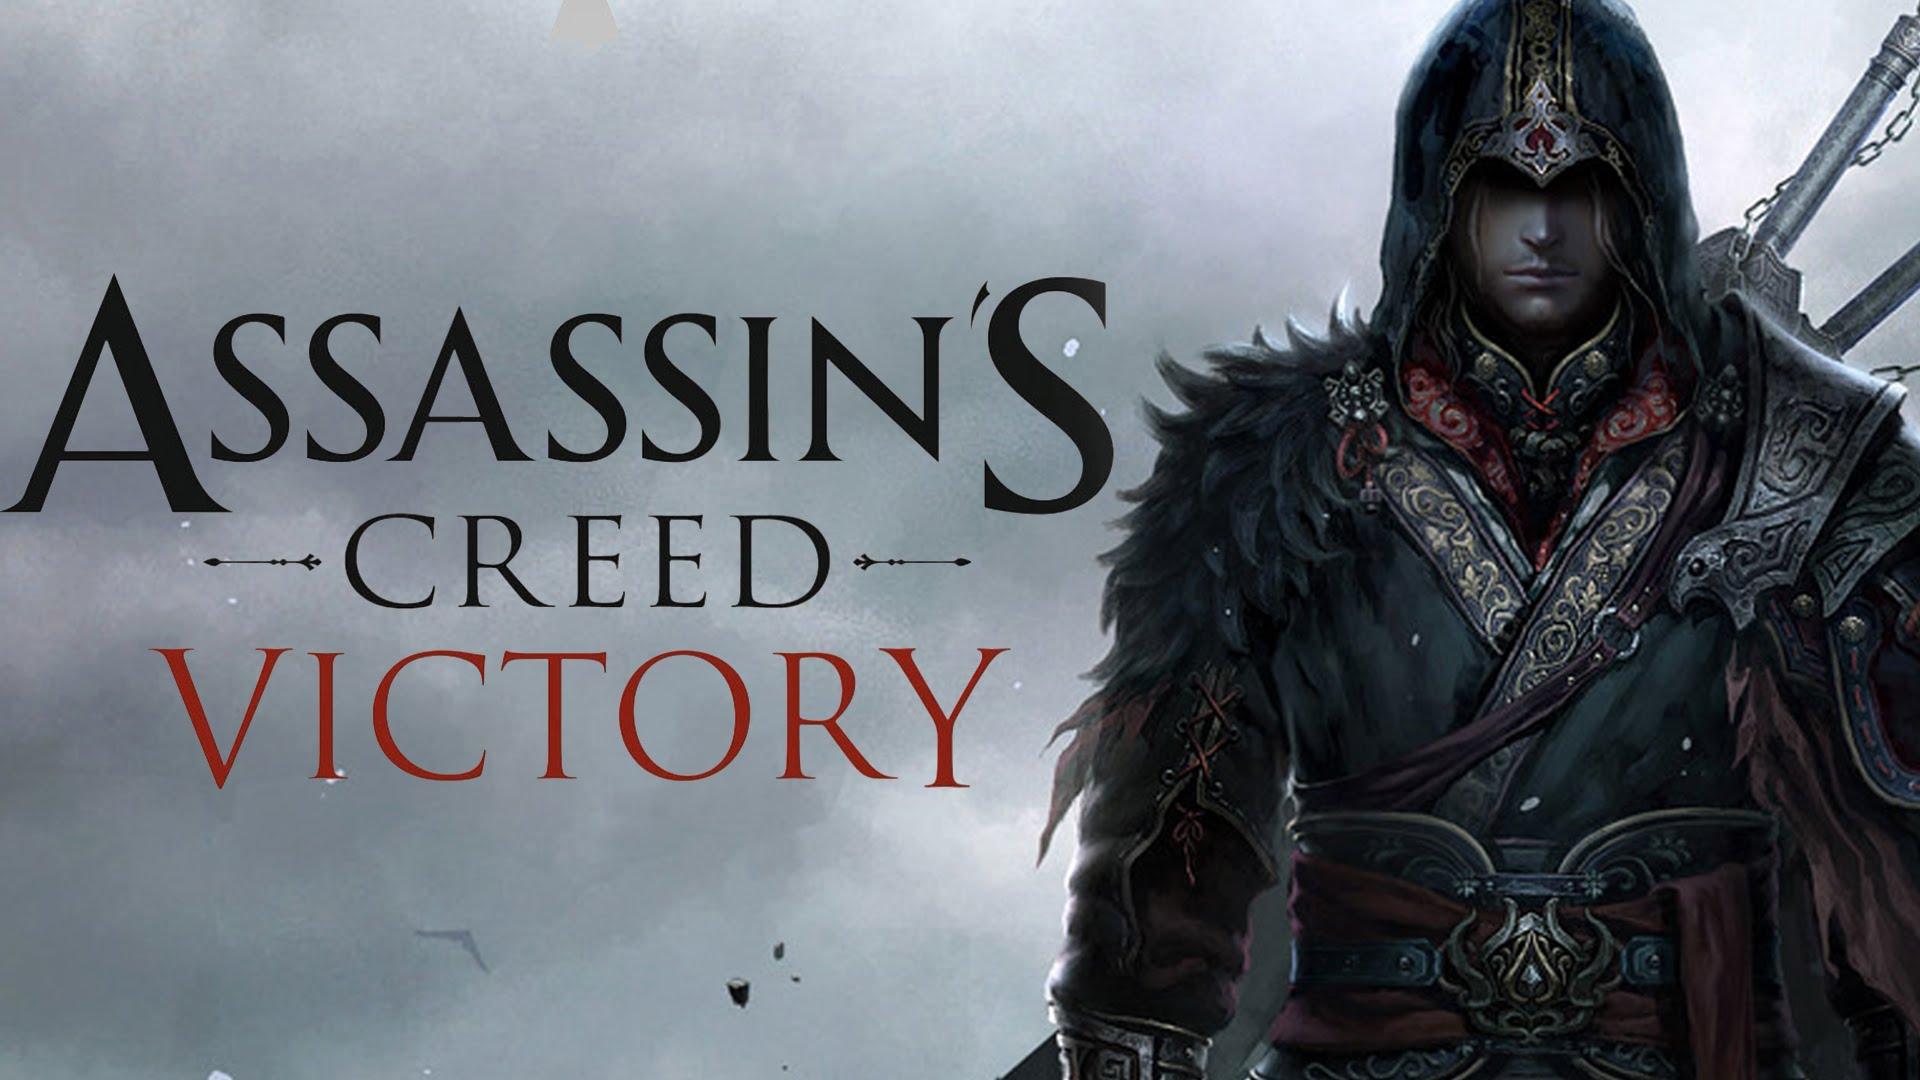 Assassins creed: bloodlines /rus/ [iso] psp игры psp psp.